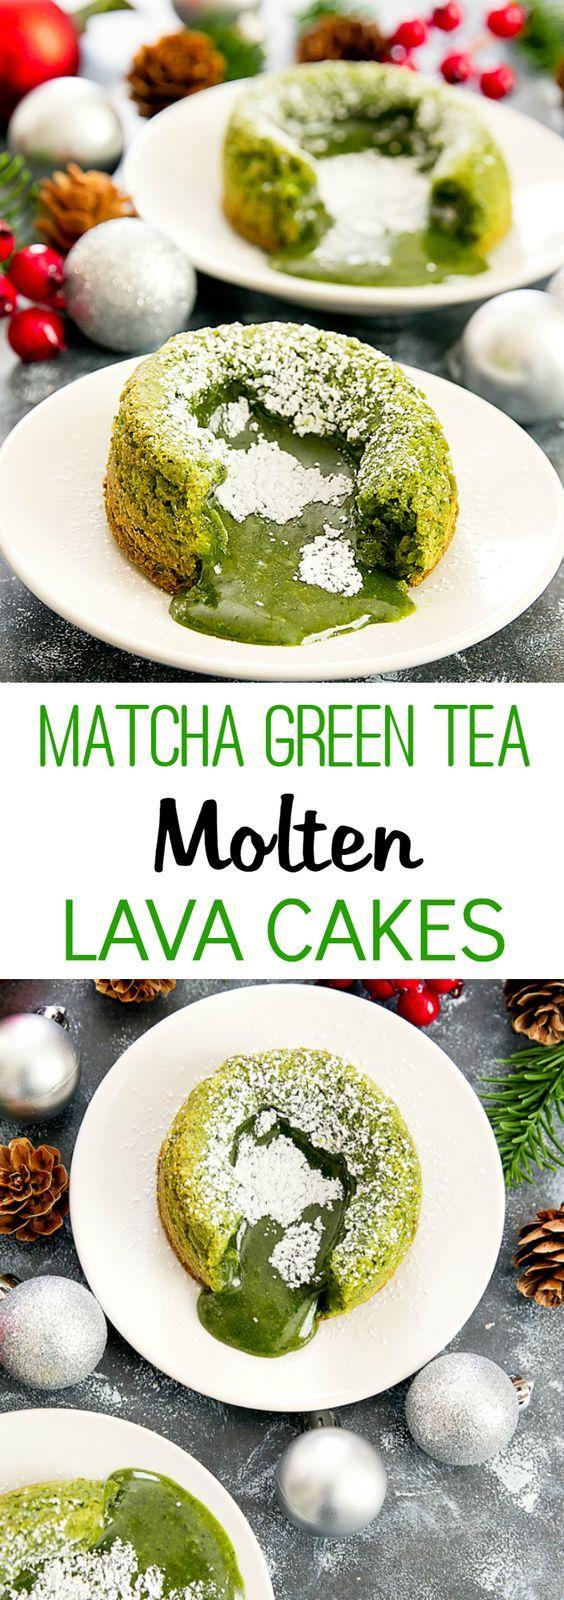 MATCHA GREEN TEA MOLTEN LAVA CAKES | Cake And Food Recipe